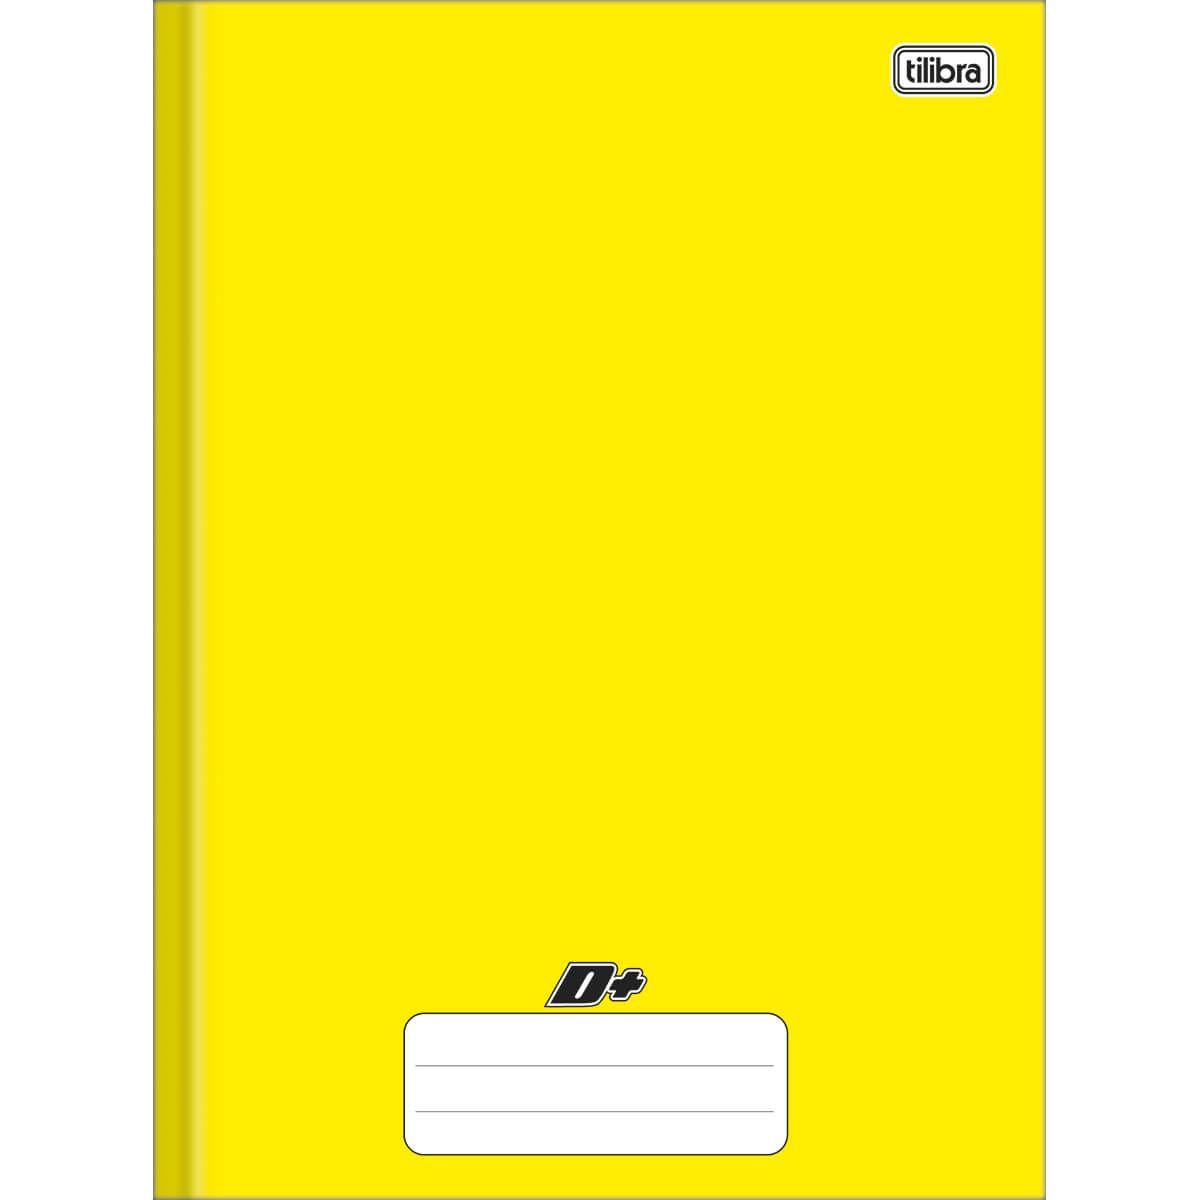 Caderno brochura 96 fls amarelo D+ Tilibra